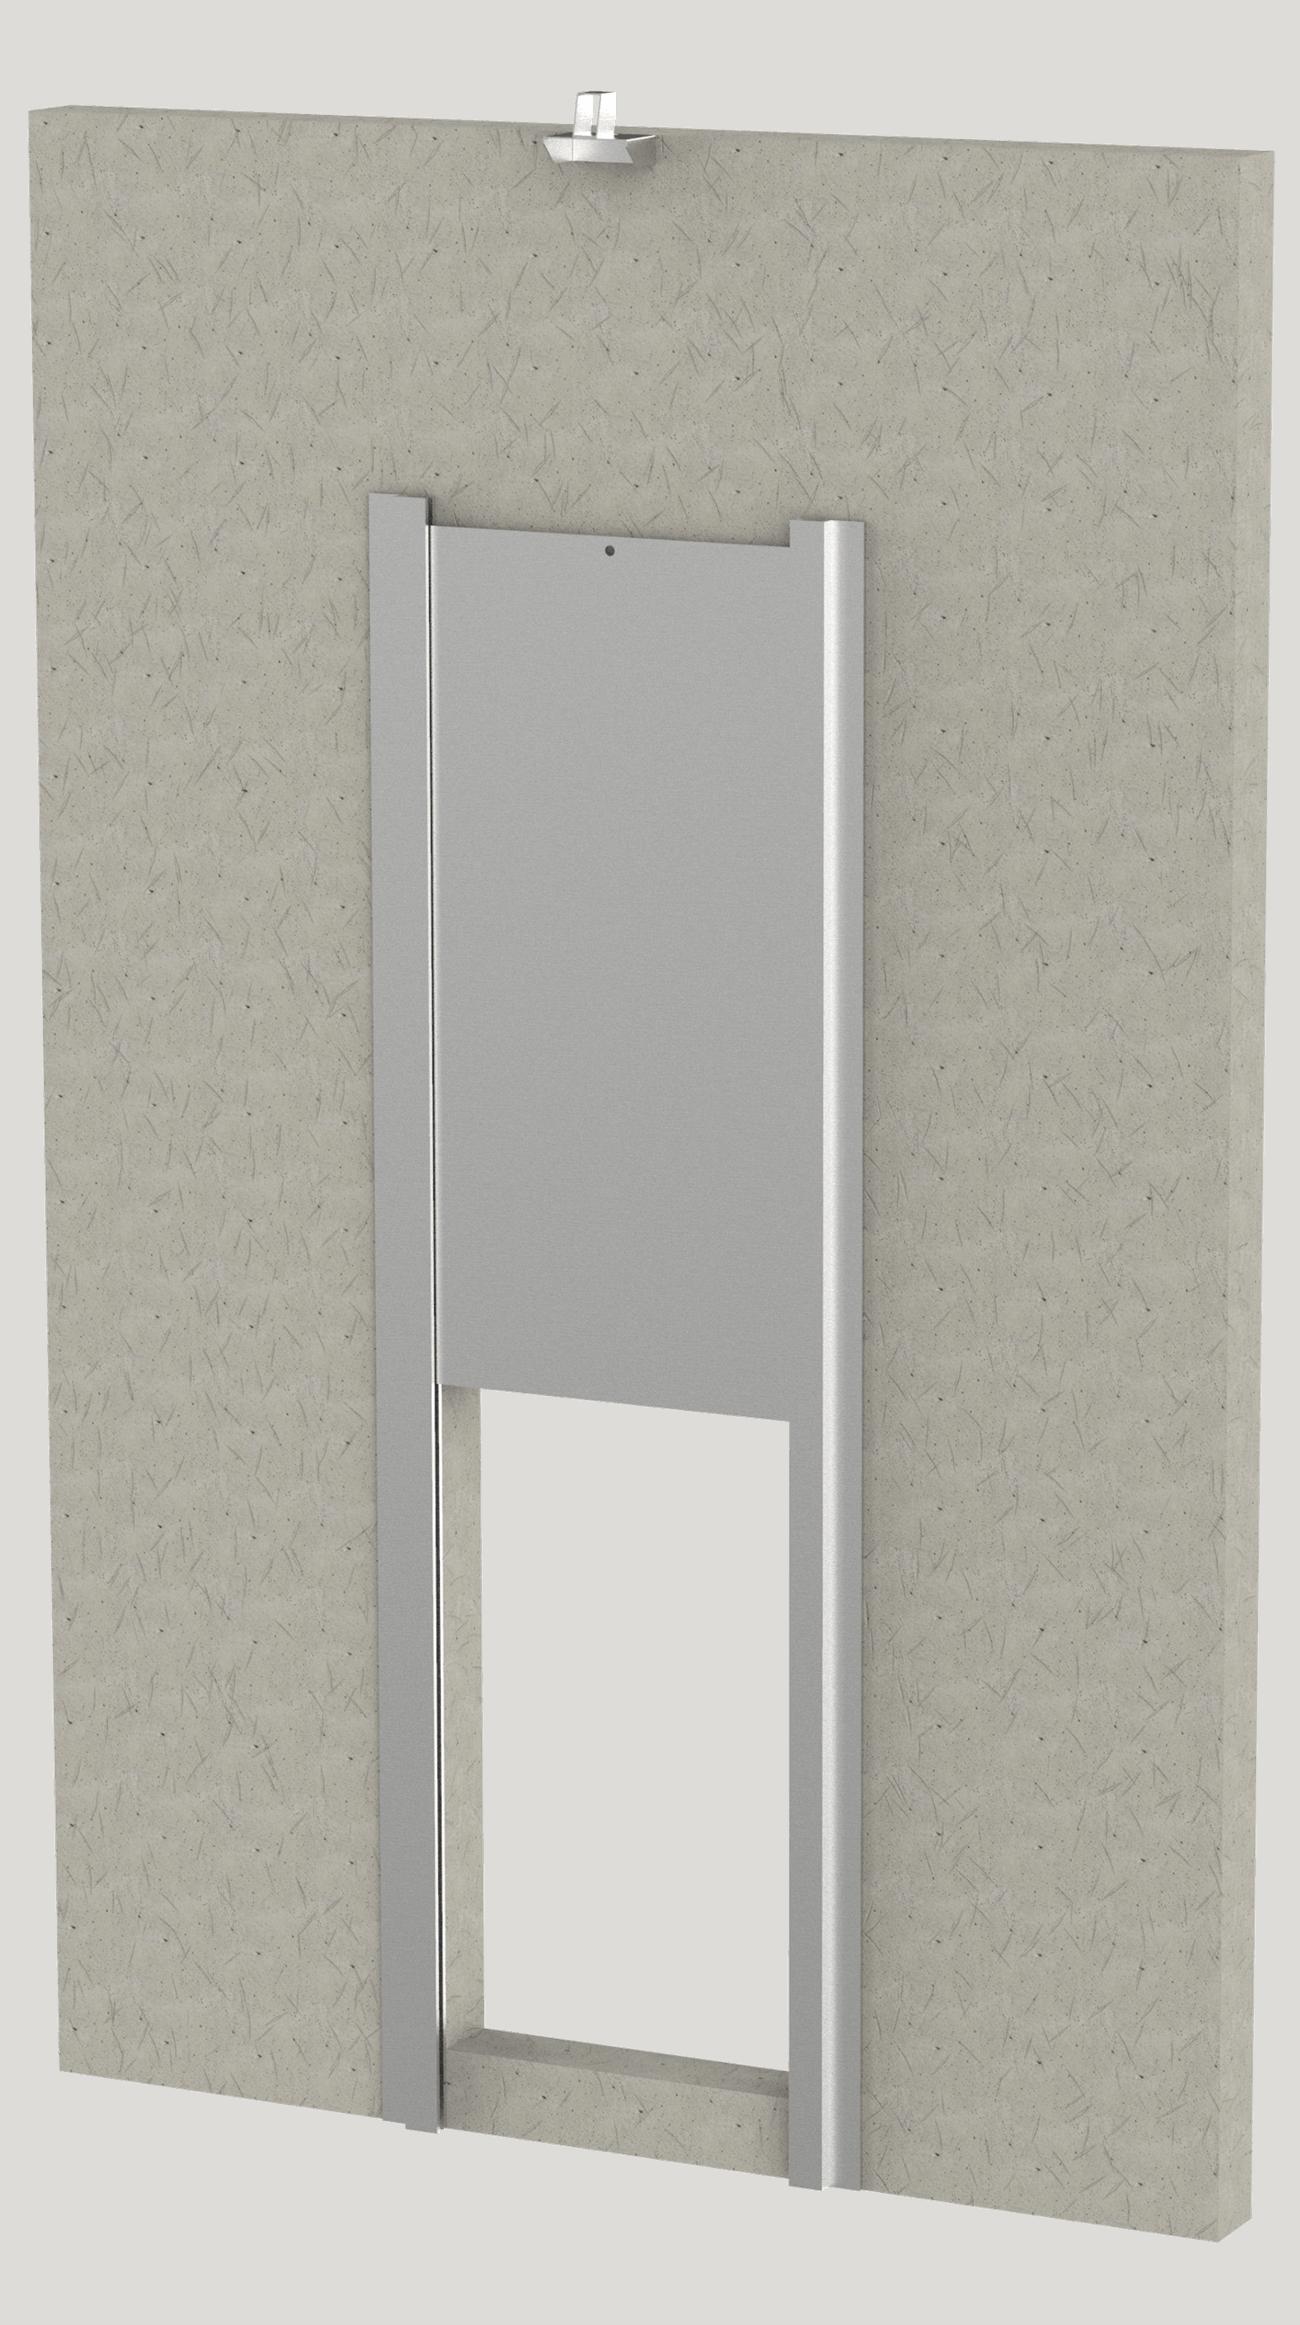 block wall transfer door